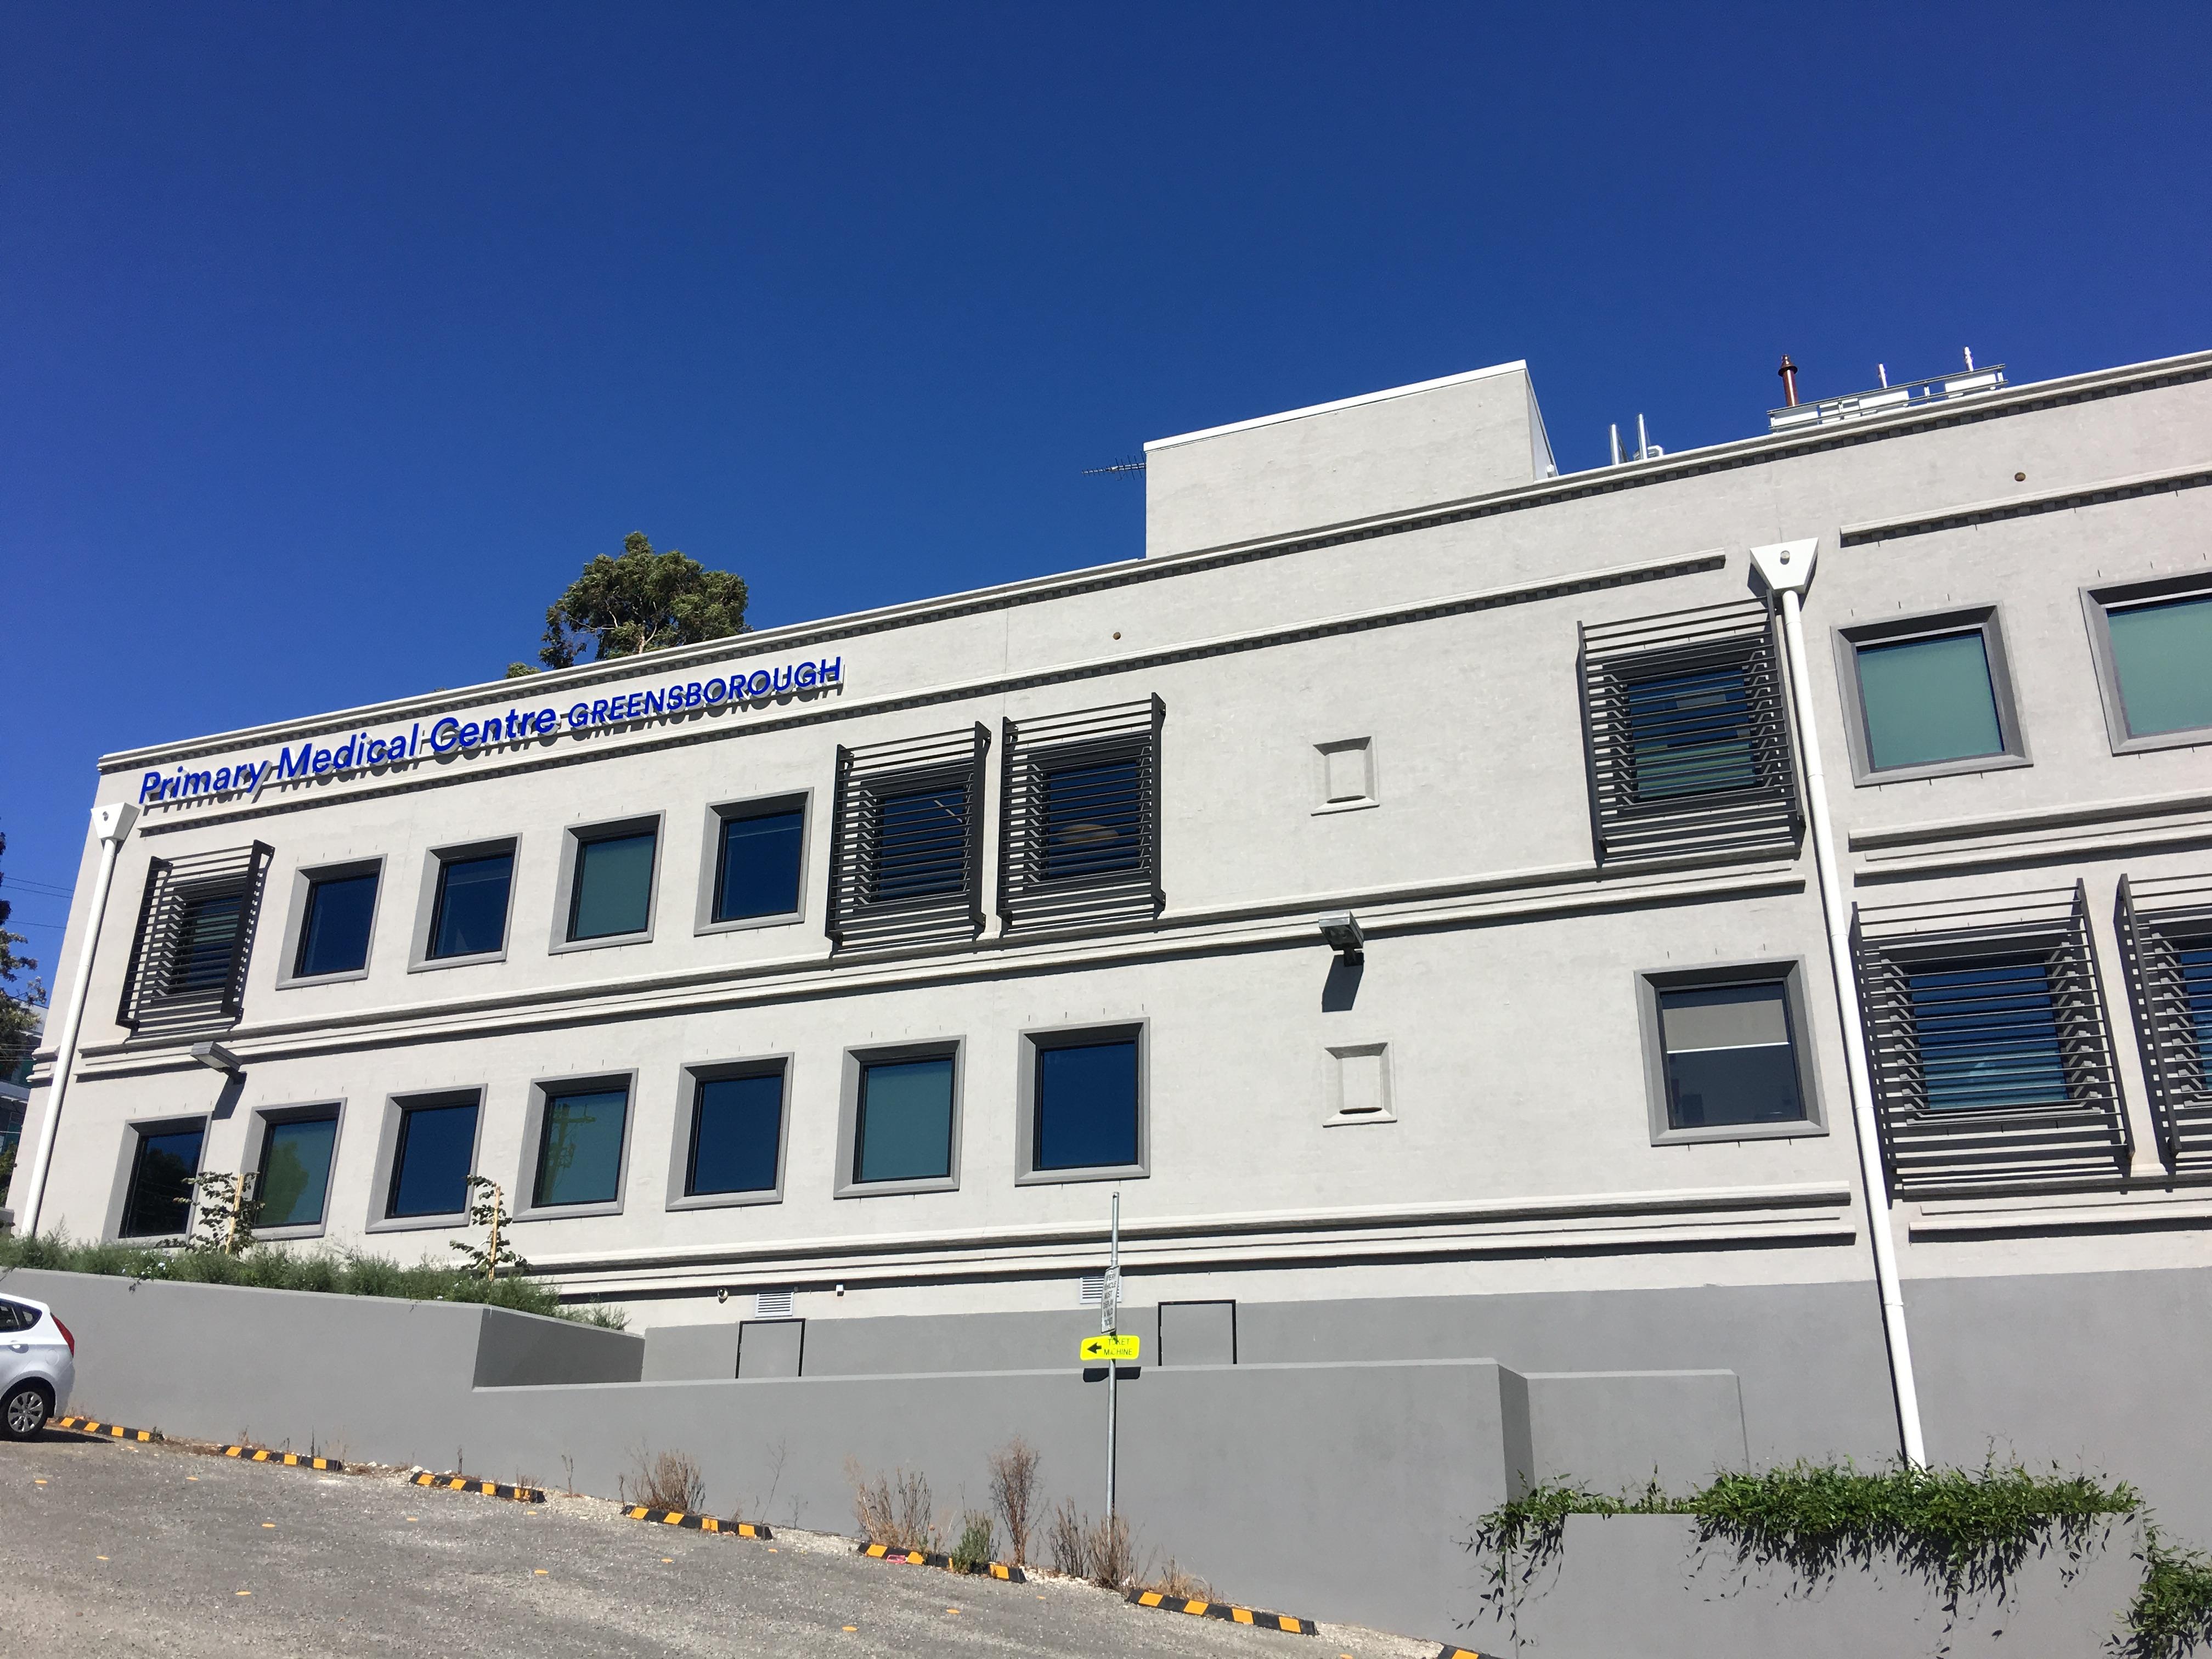 GREENSBOROUGH MEDICAL CENTRE